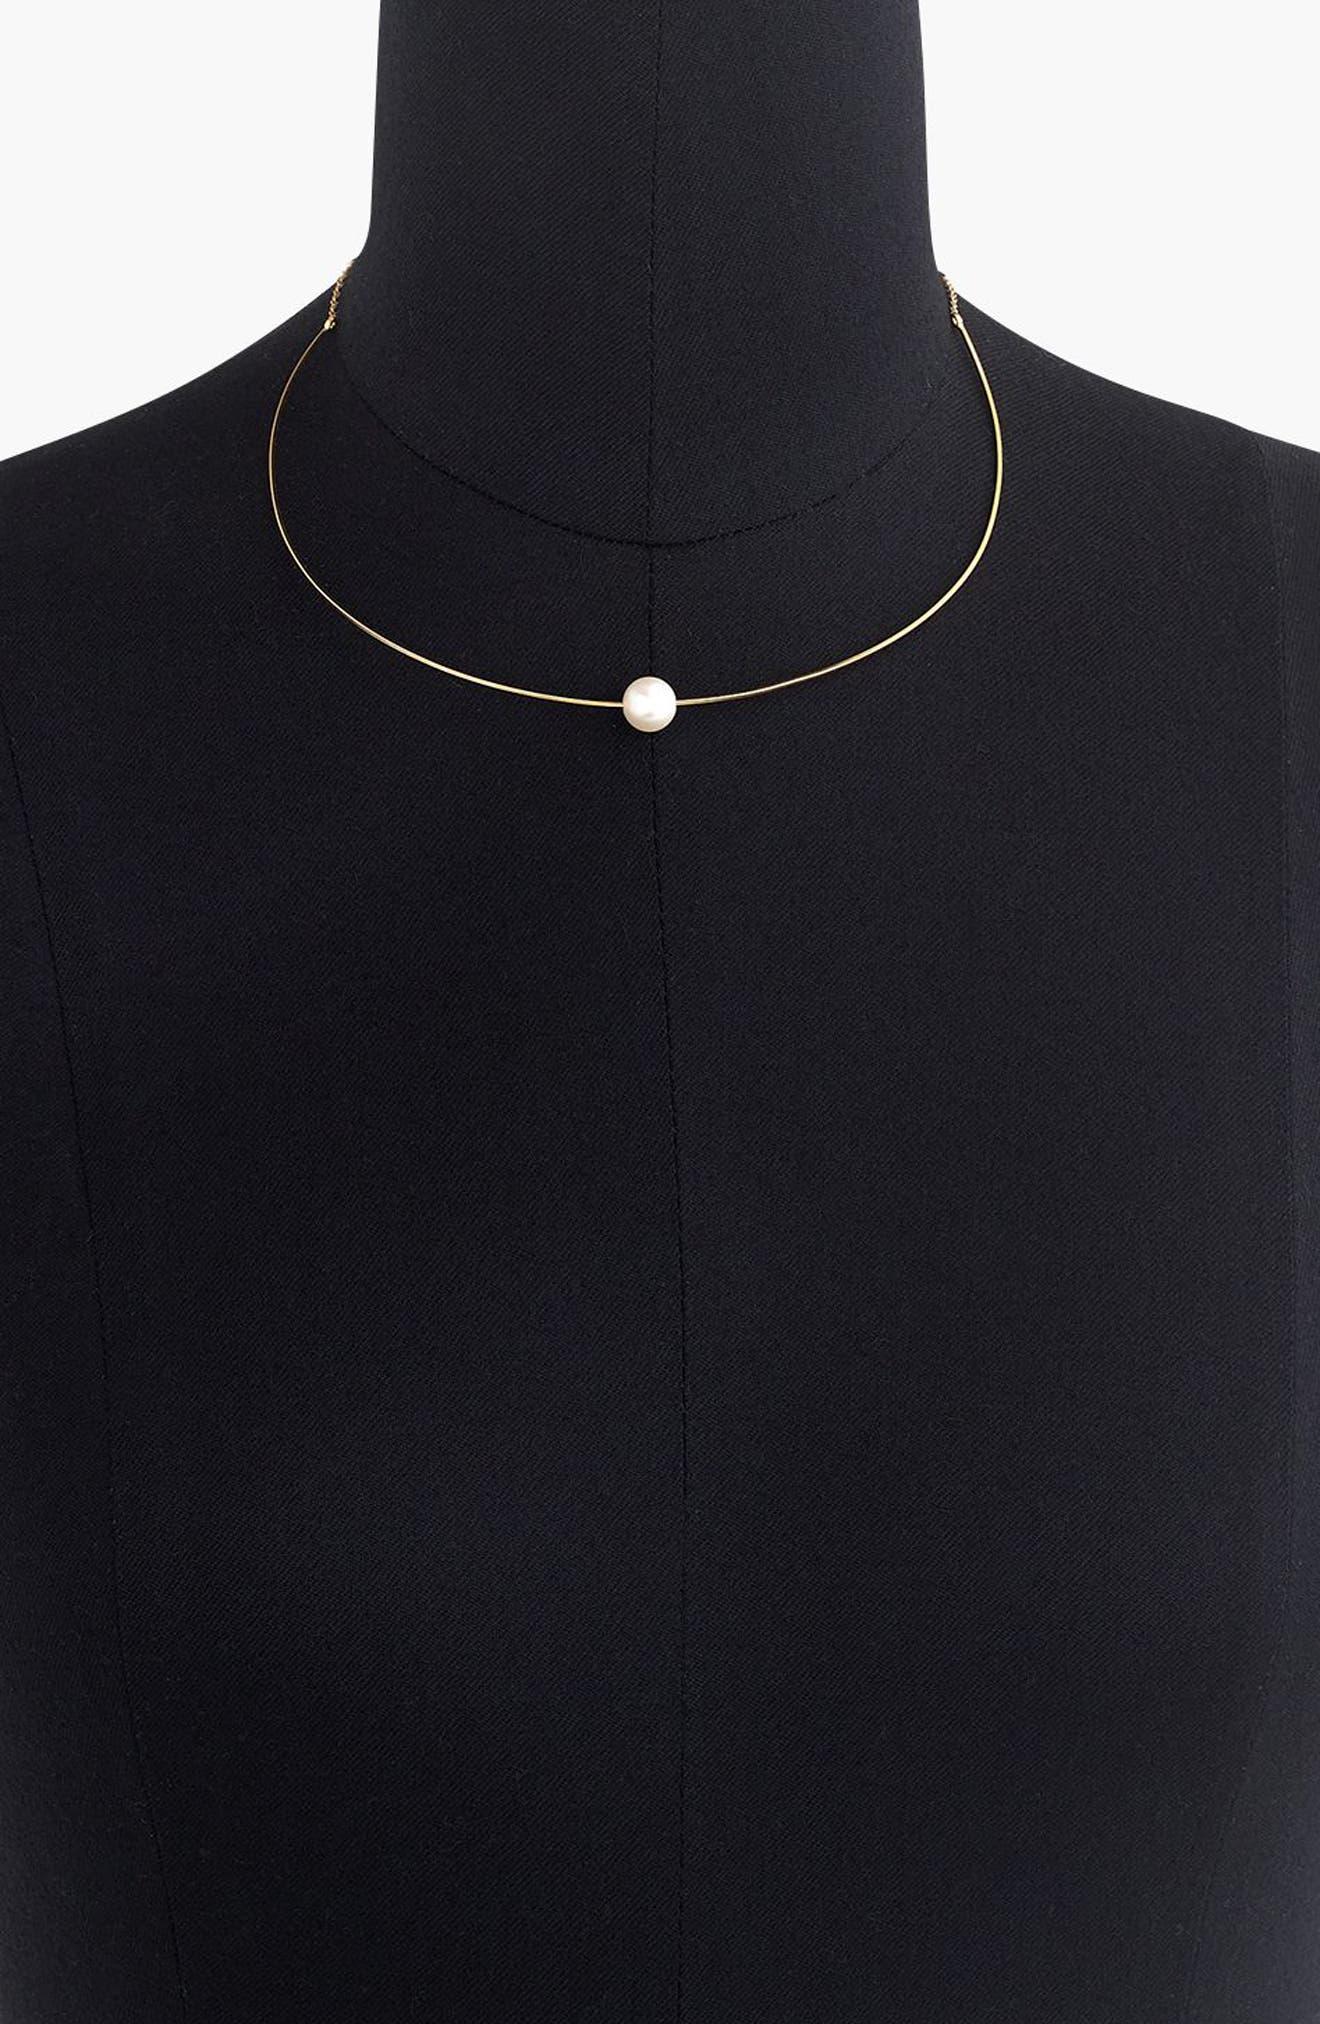 J.Crew Single Imitation Pearl Collar Necklace,                             Alternate thumbnail 2, color,                             Gold